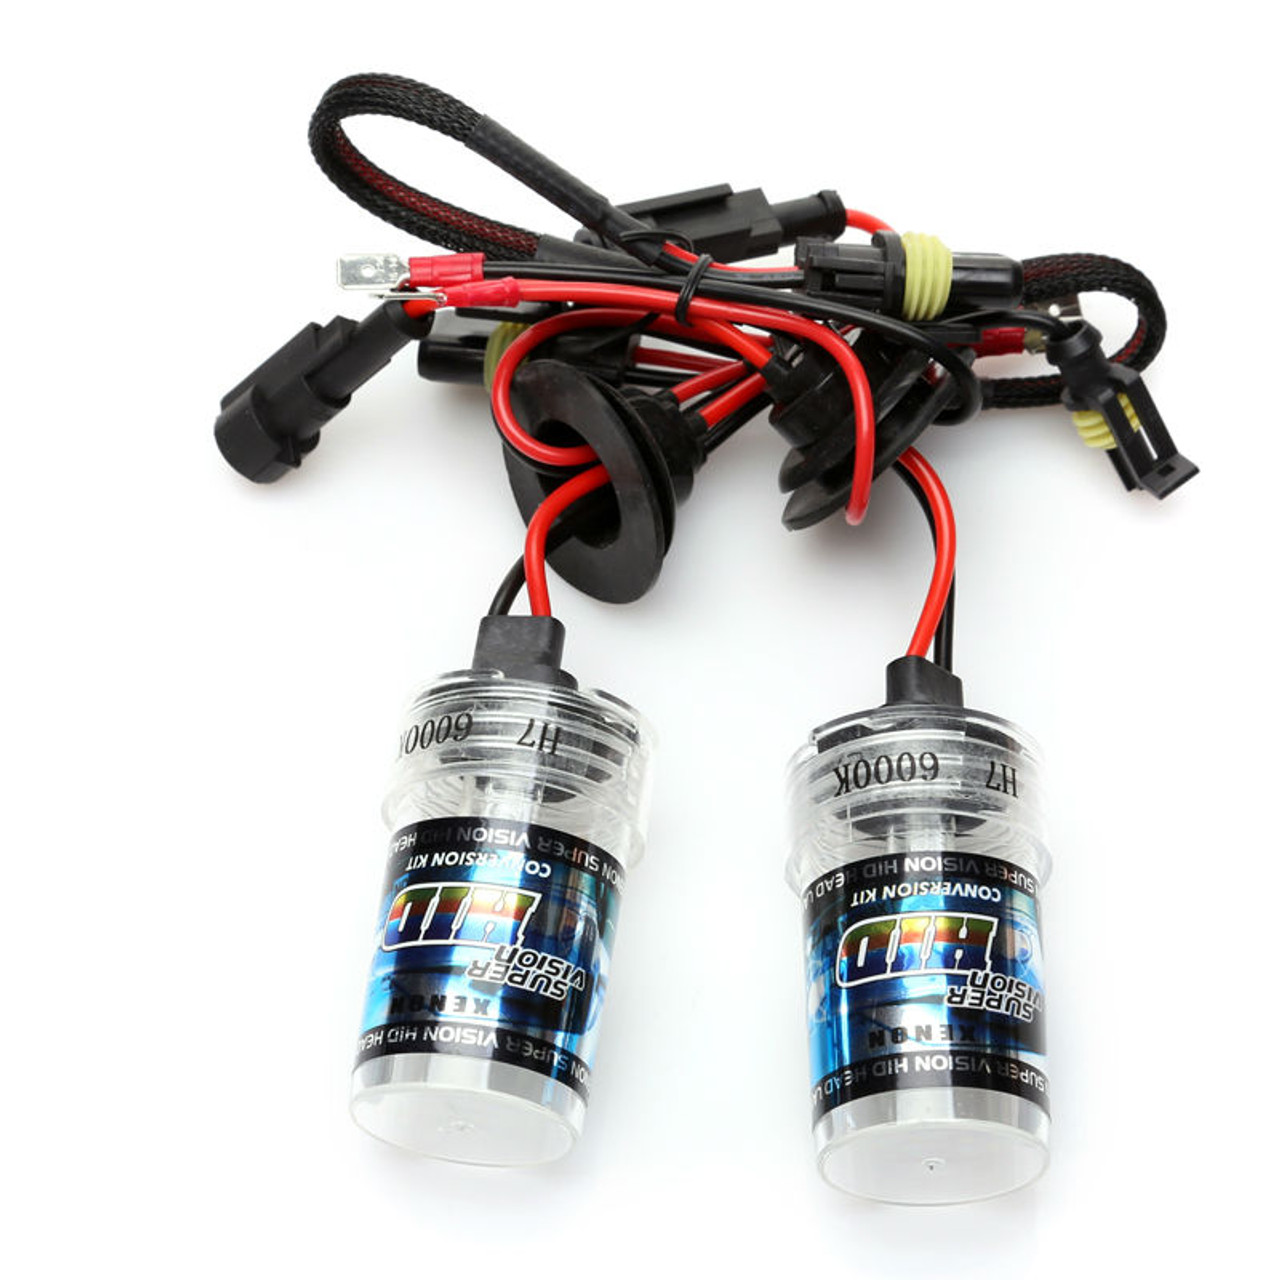 BOOMBOOST 55W HID Xenon Kit 4300K H8//H9//H11 xenon hid ballast HID Xenon Light bulb Headlight Lamp 12V xenon kit